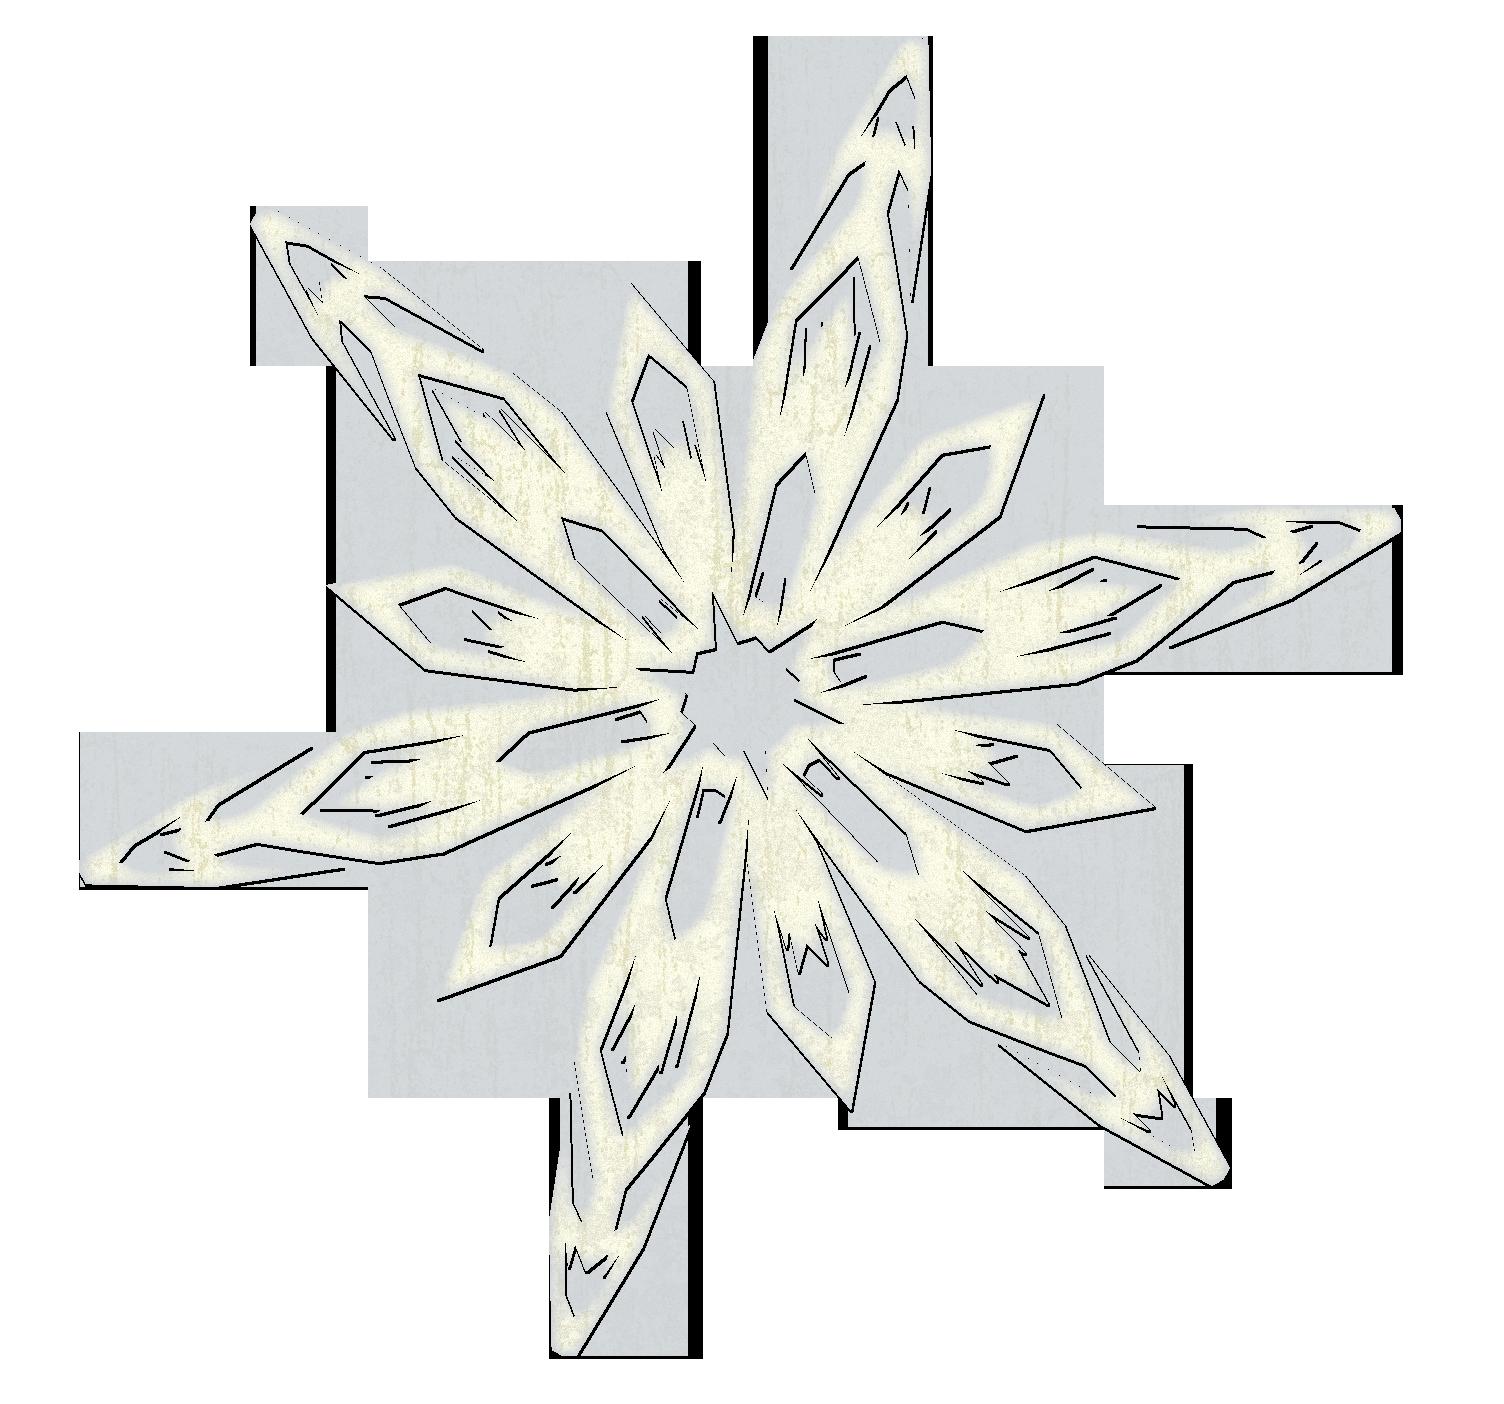 Snowflakes PNG Image Snowflakes, Png images, Image